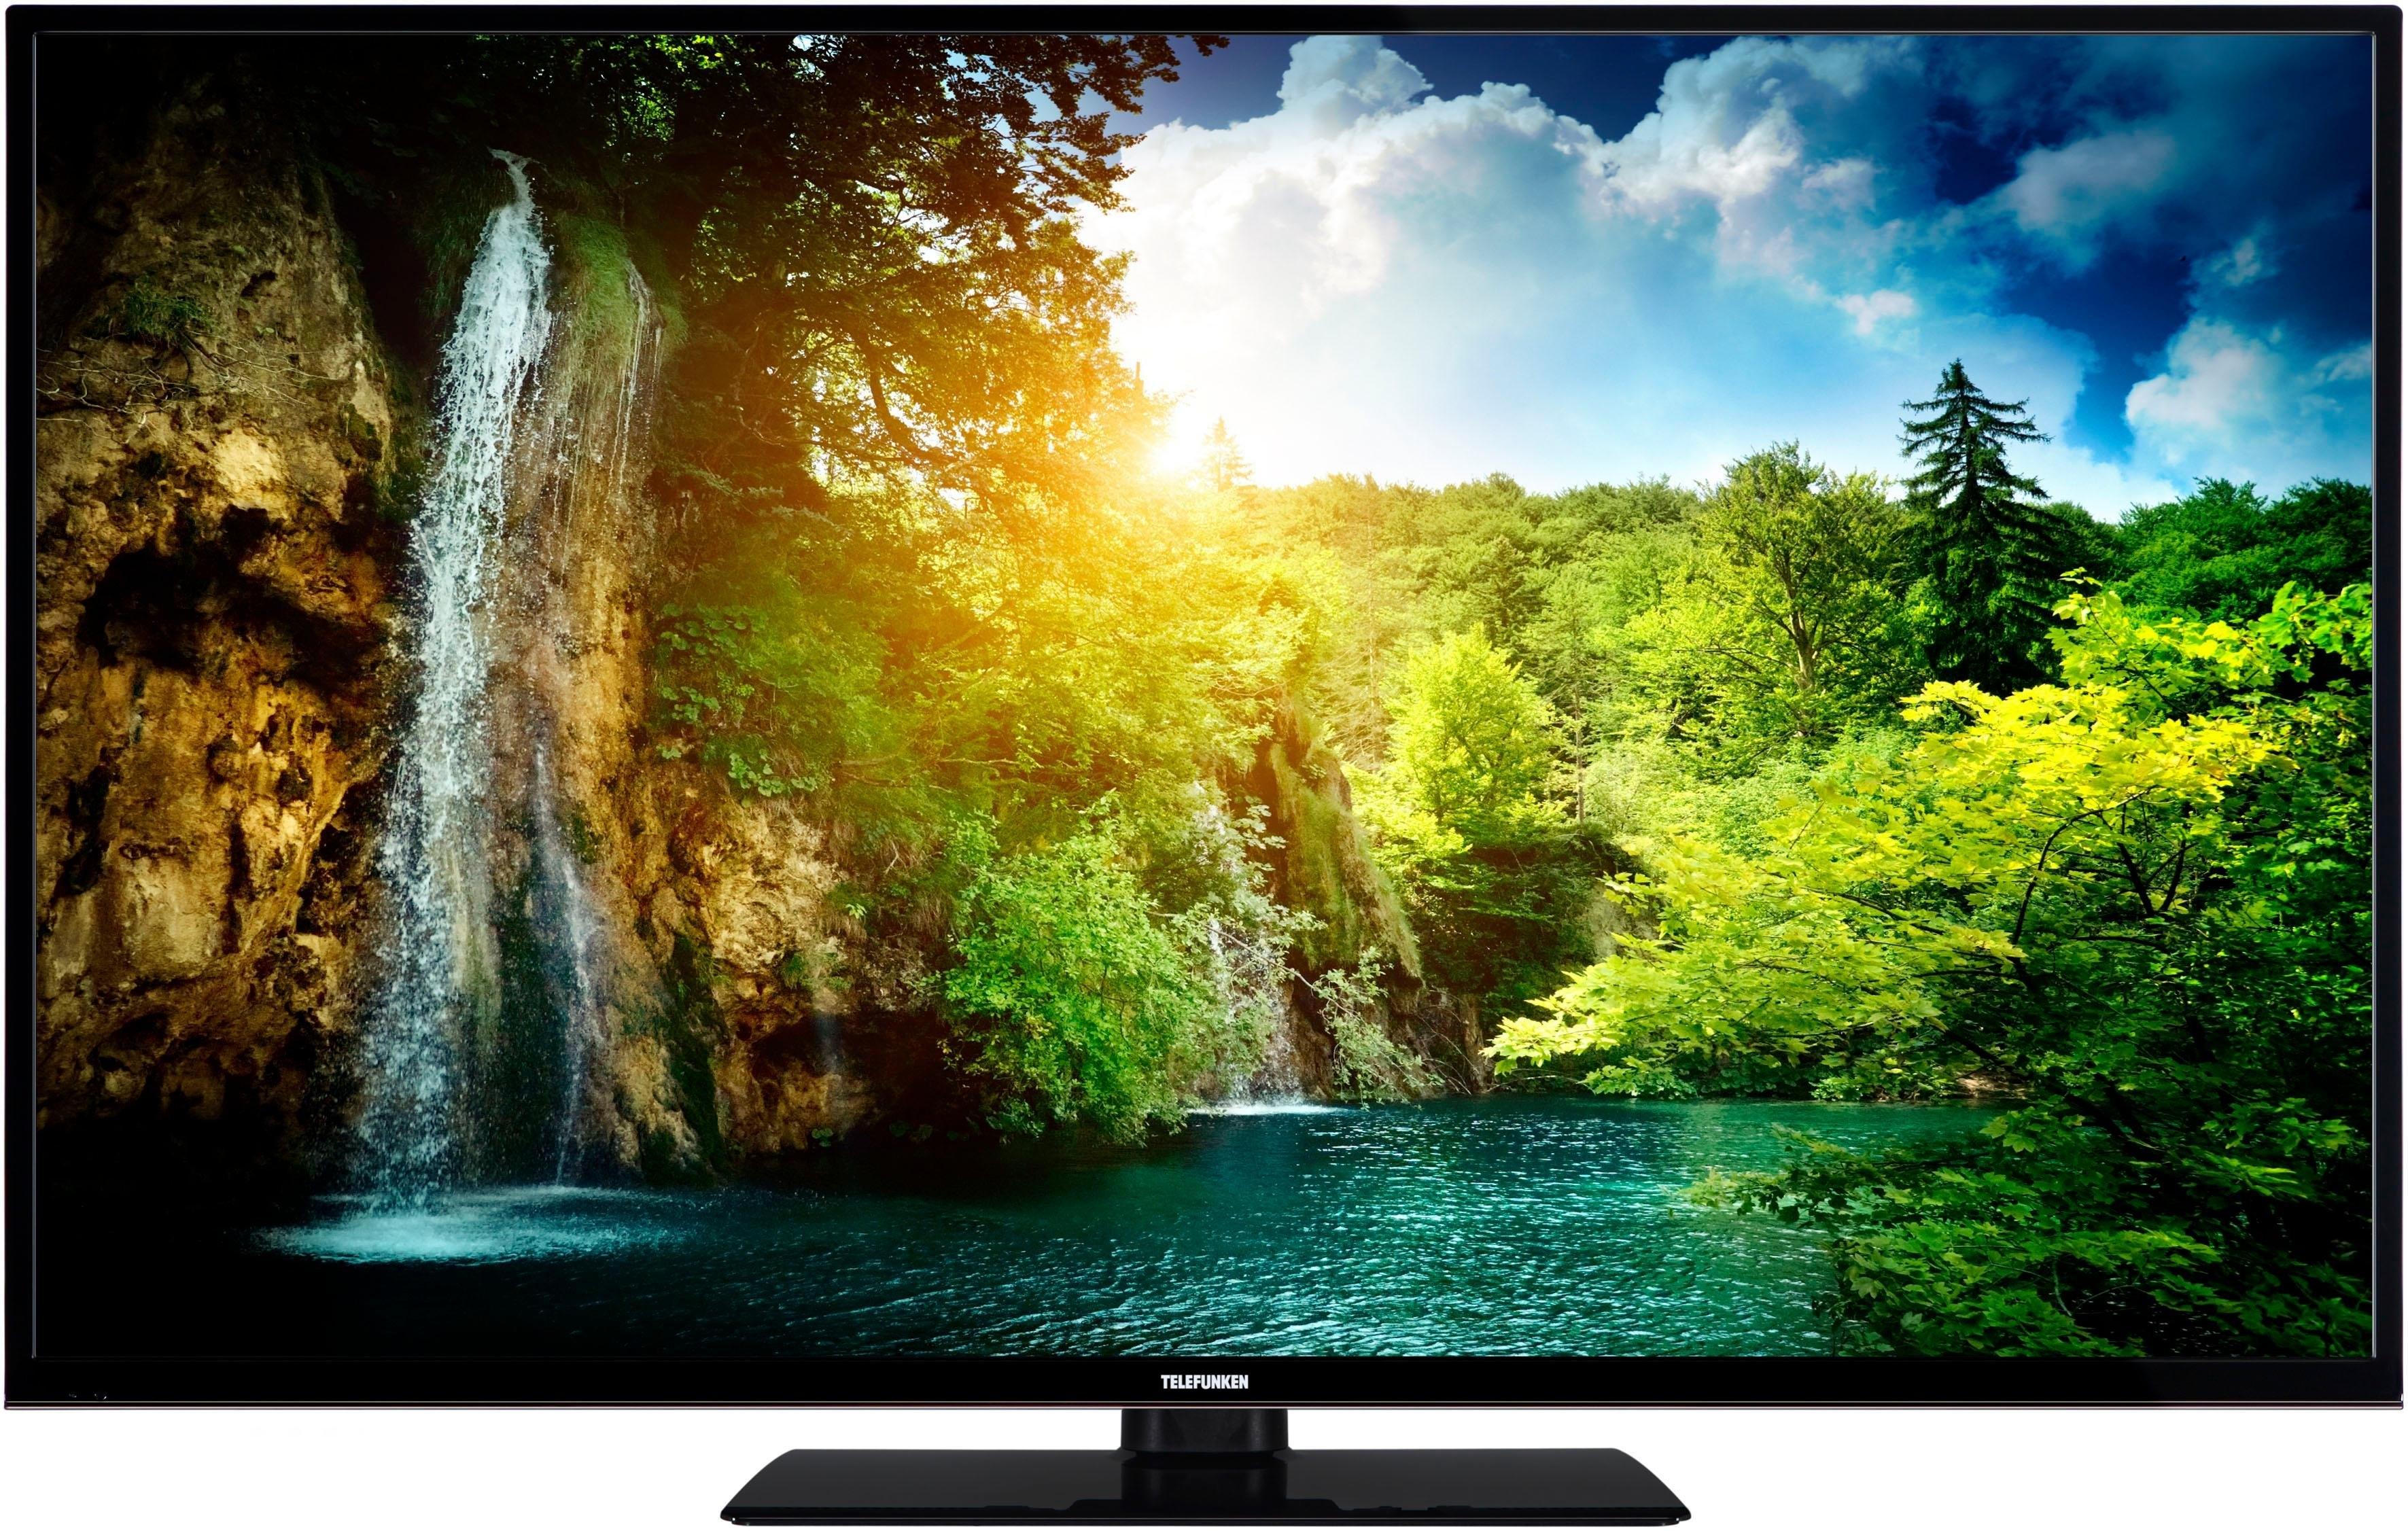 Telefunken D40U297M4CW led-tv (40 inch), 4K Ultra HD bij OTTO online kopen